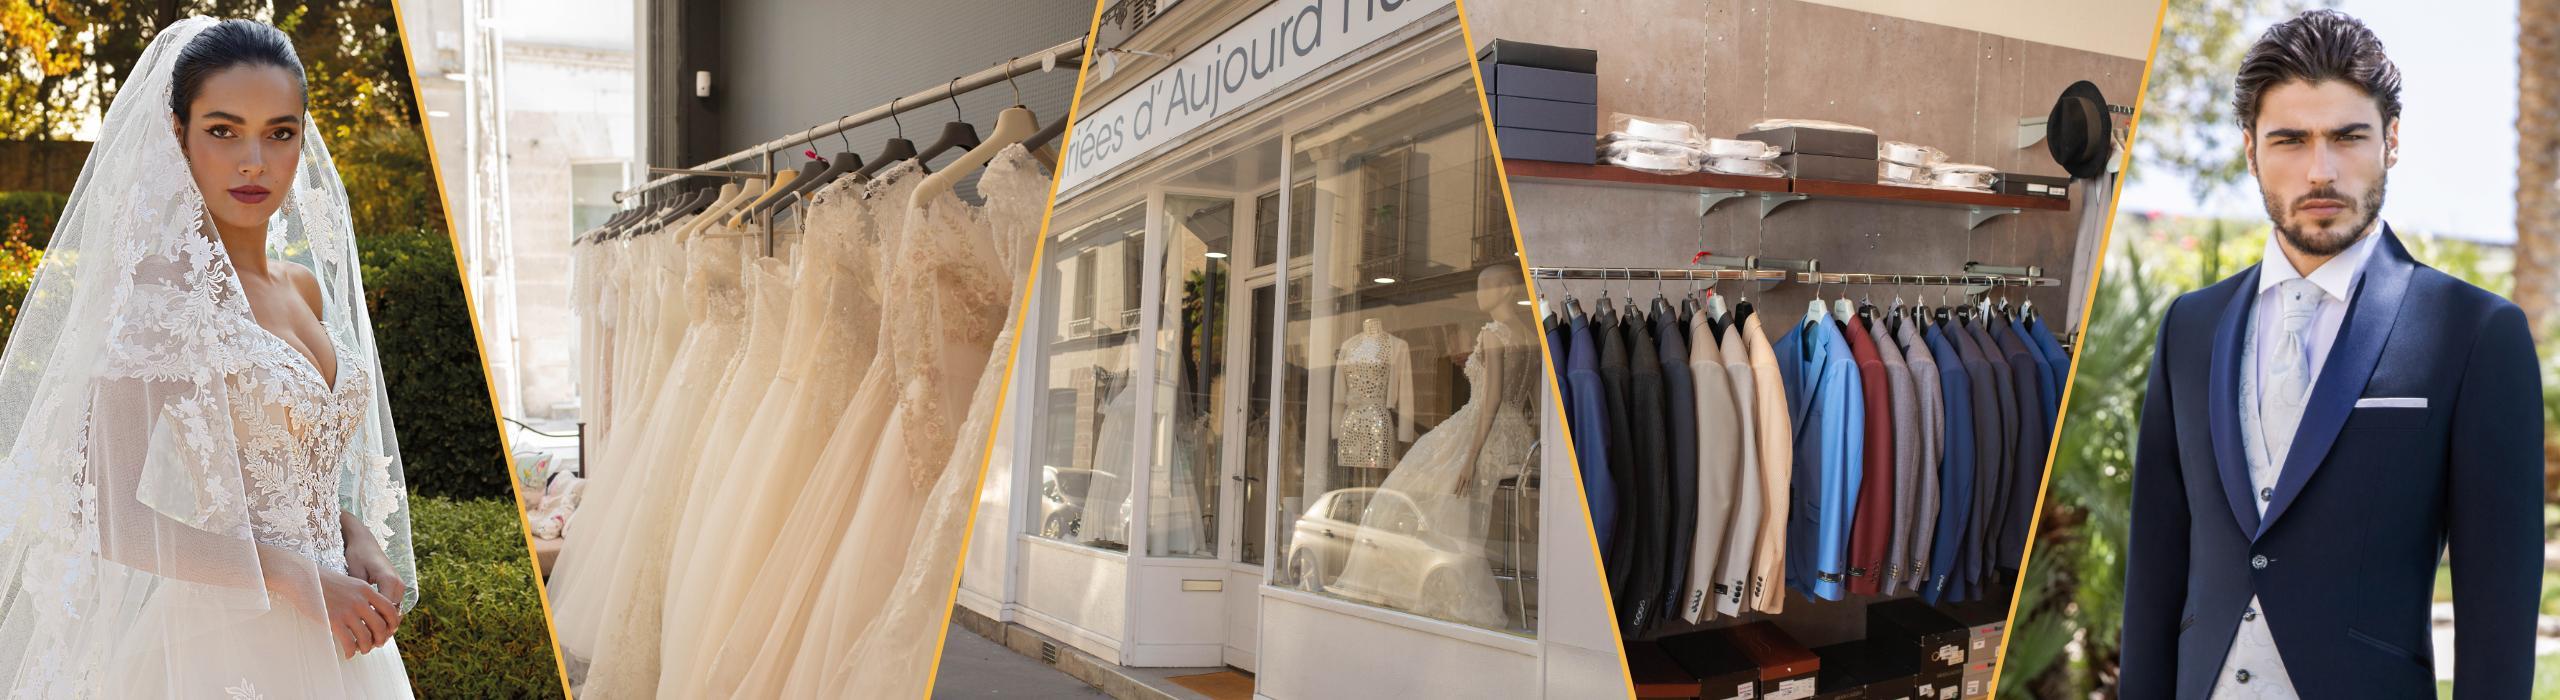 Robes et costumes de mariés